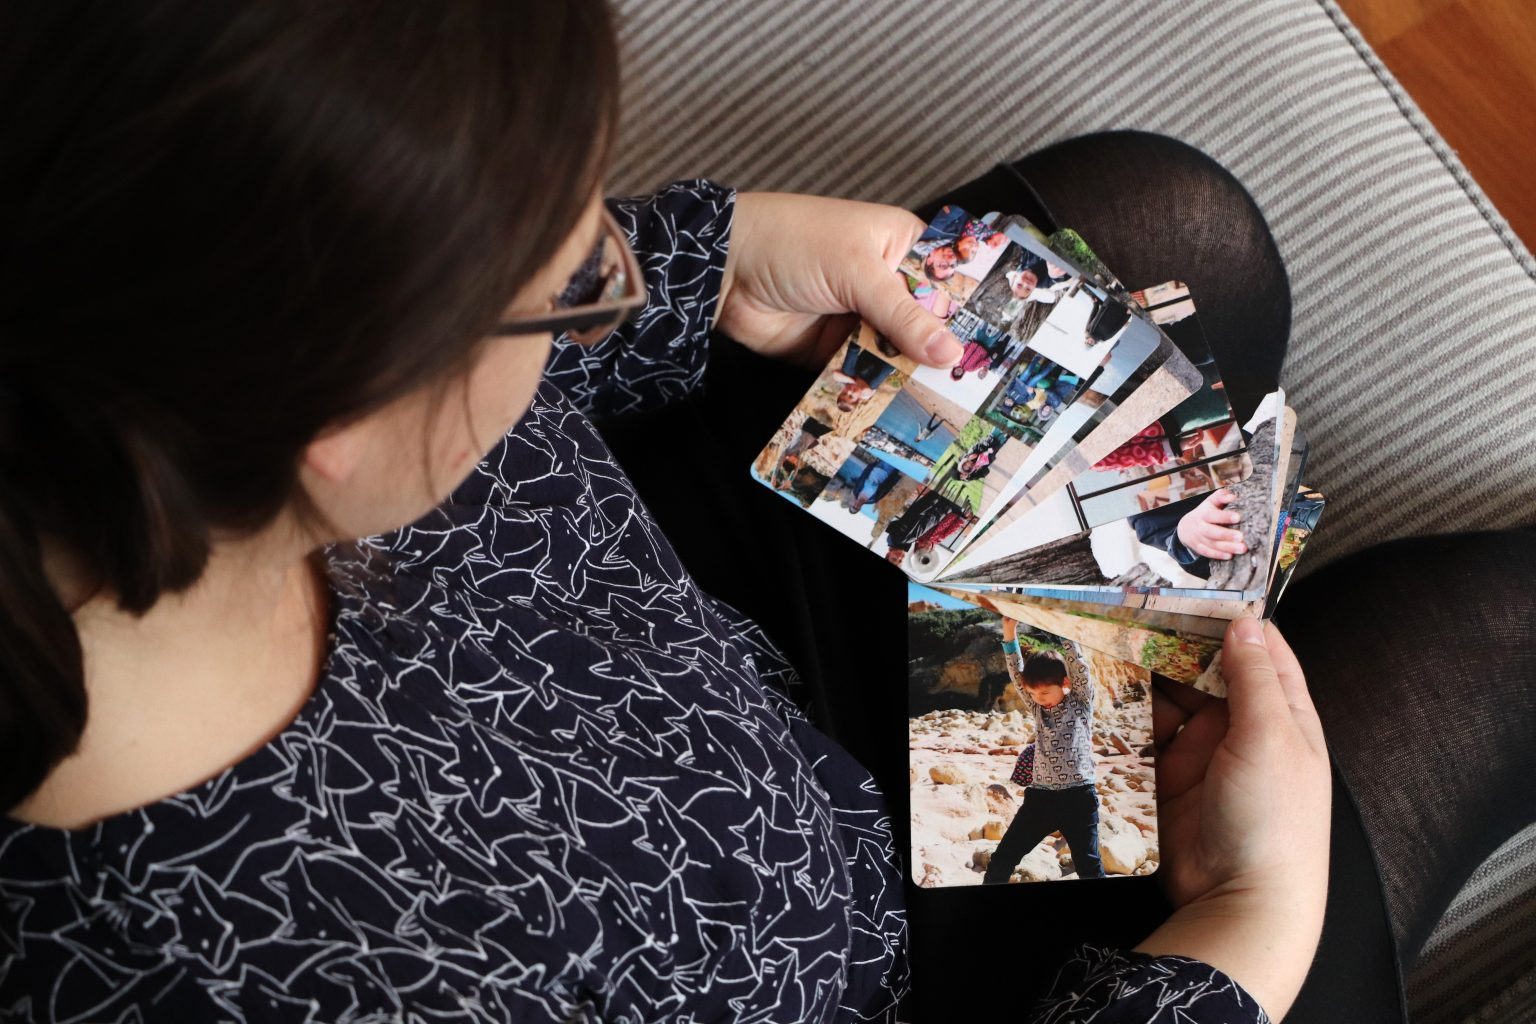 Fotogeschenk Idee Oma und Opa fingerbook